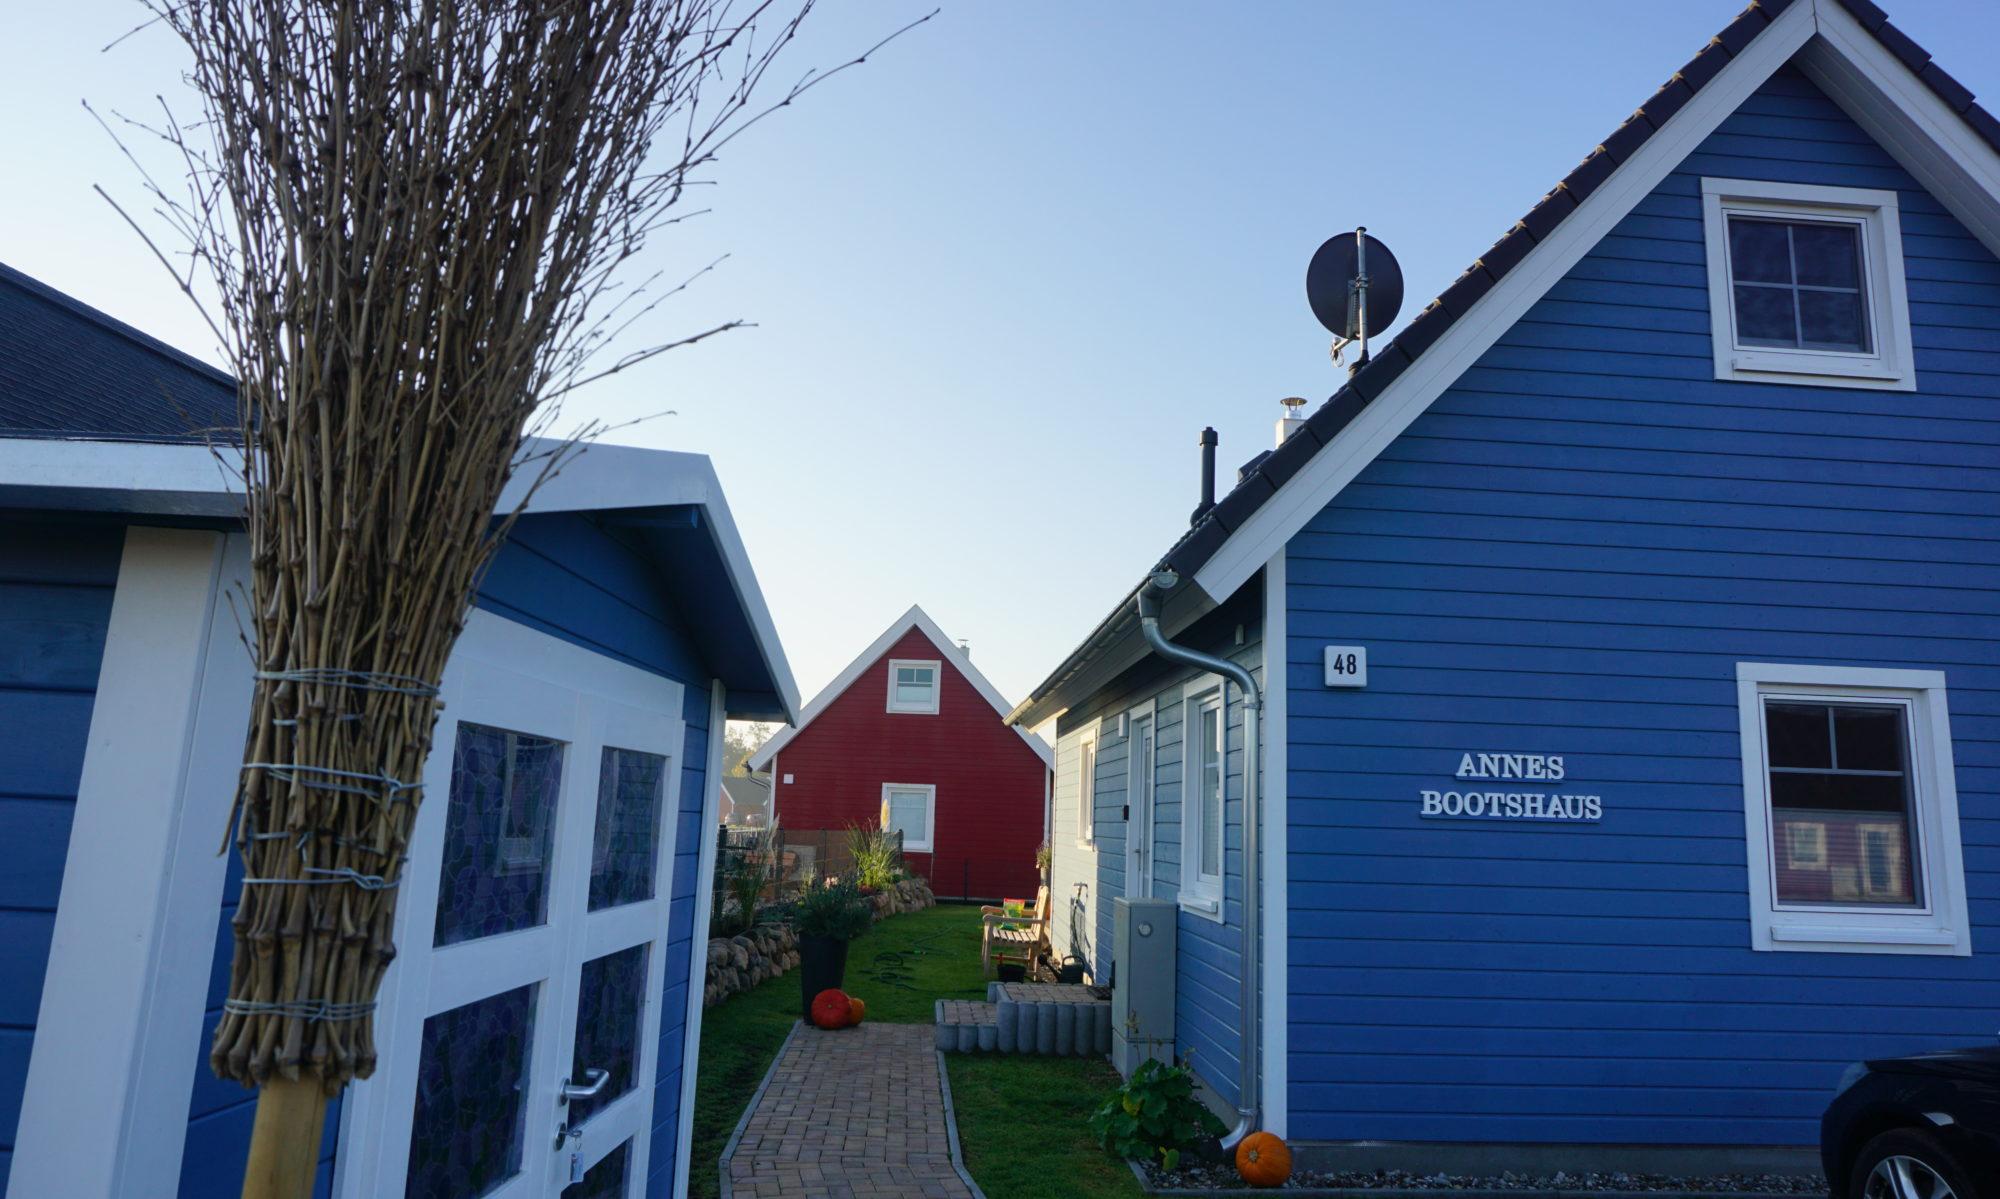 Annes Bootshaus